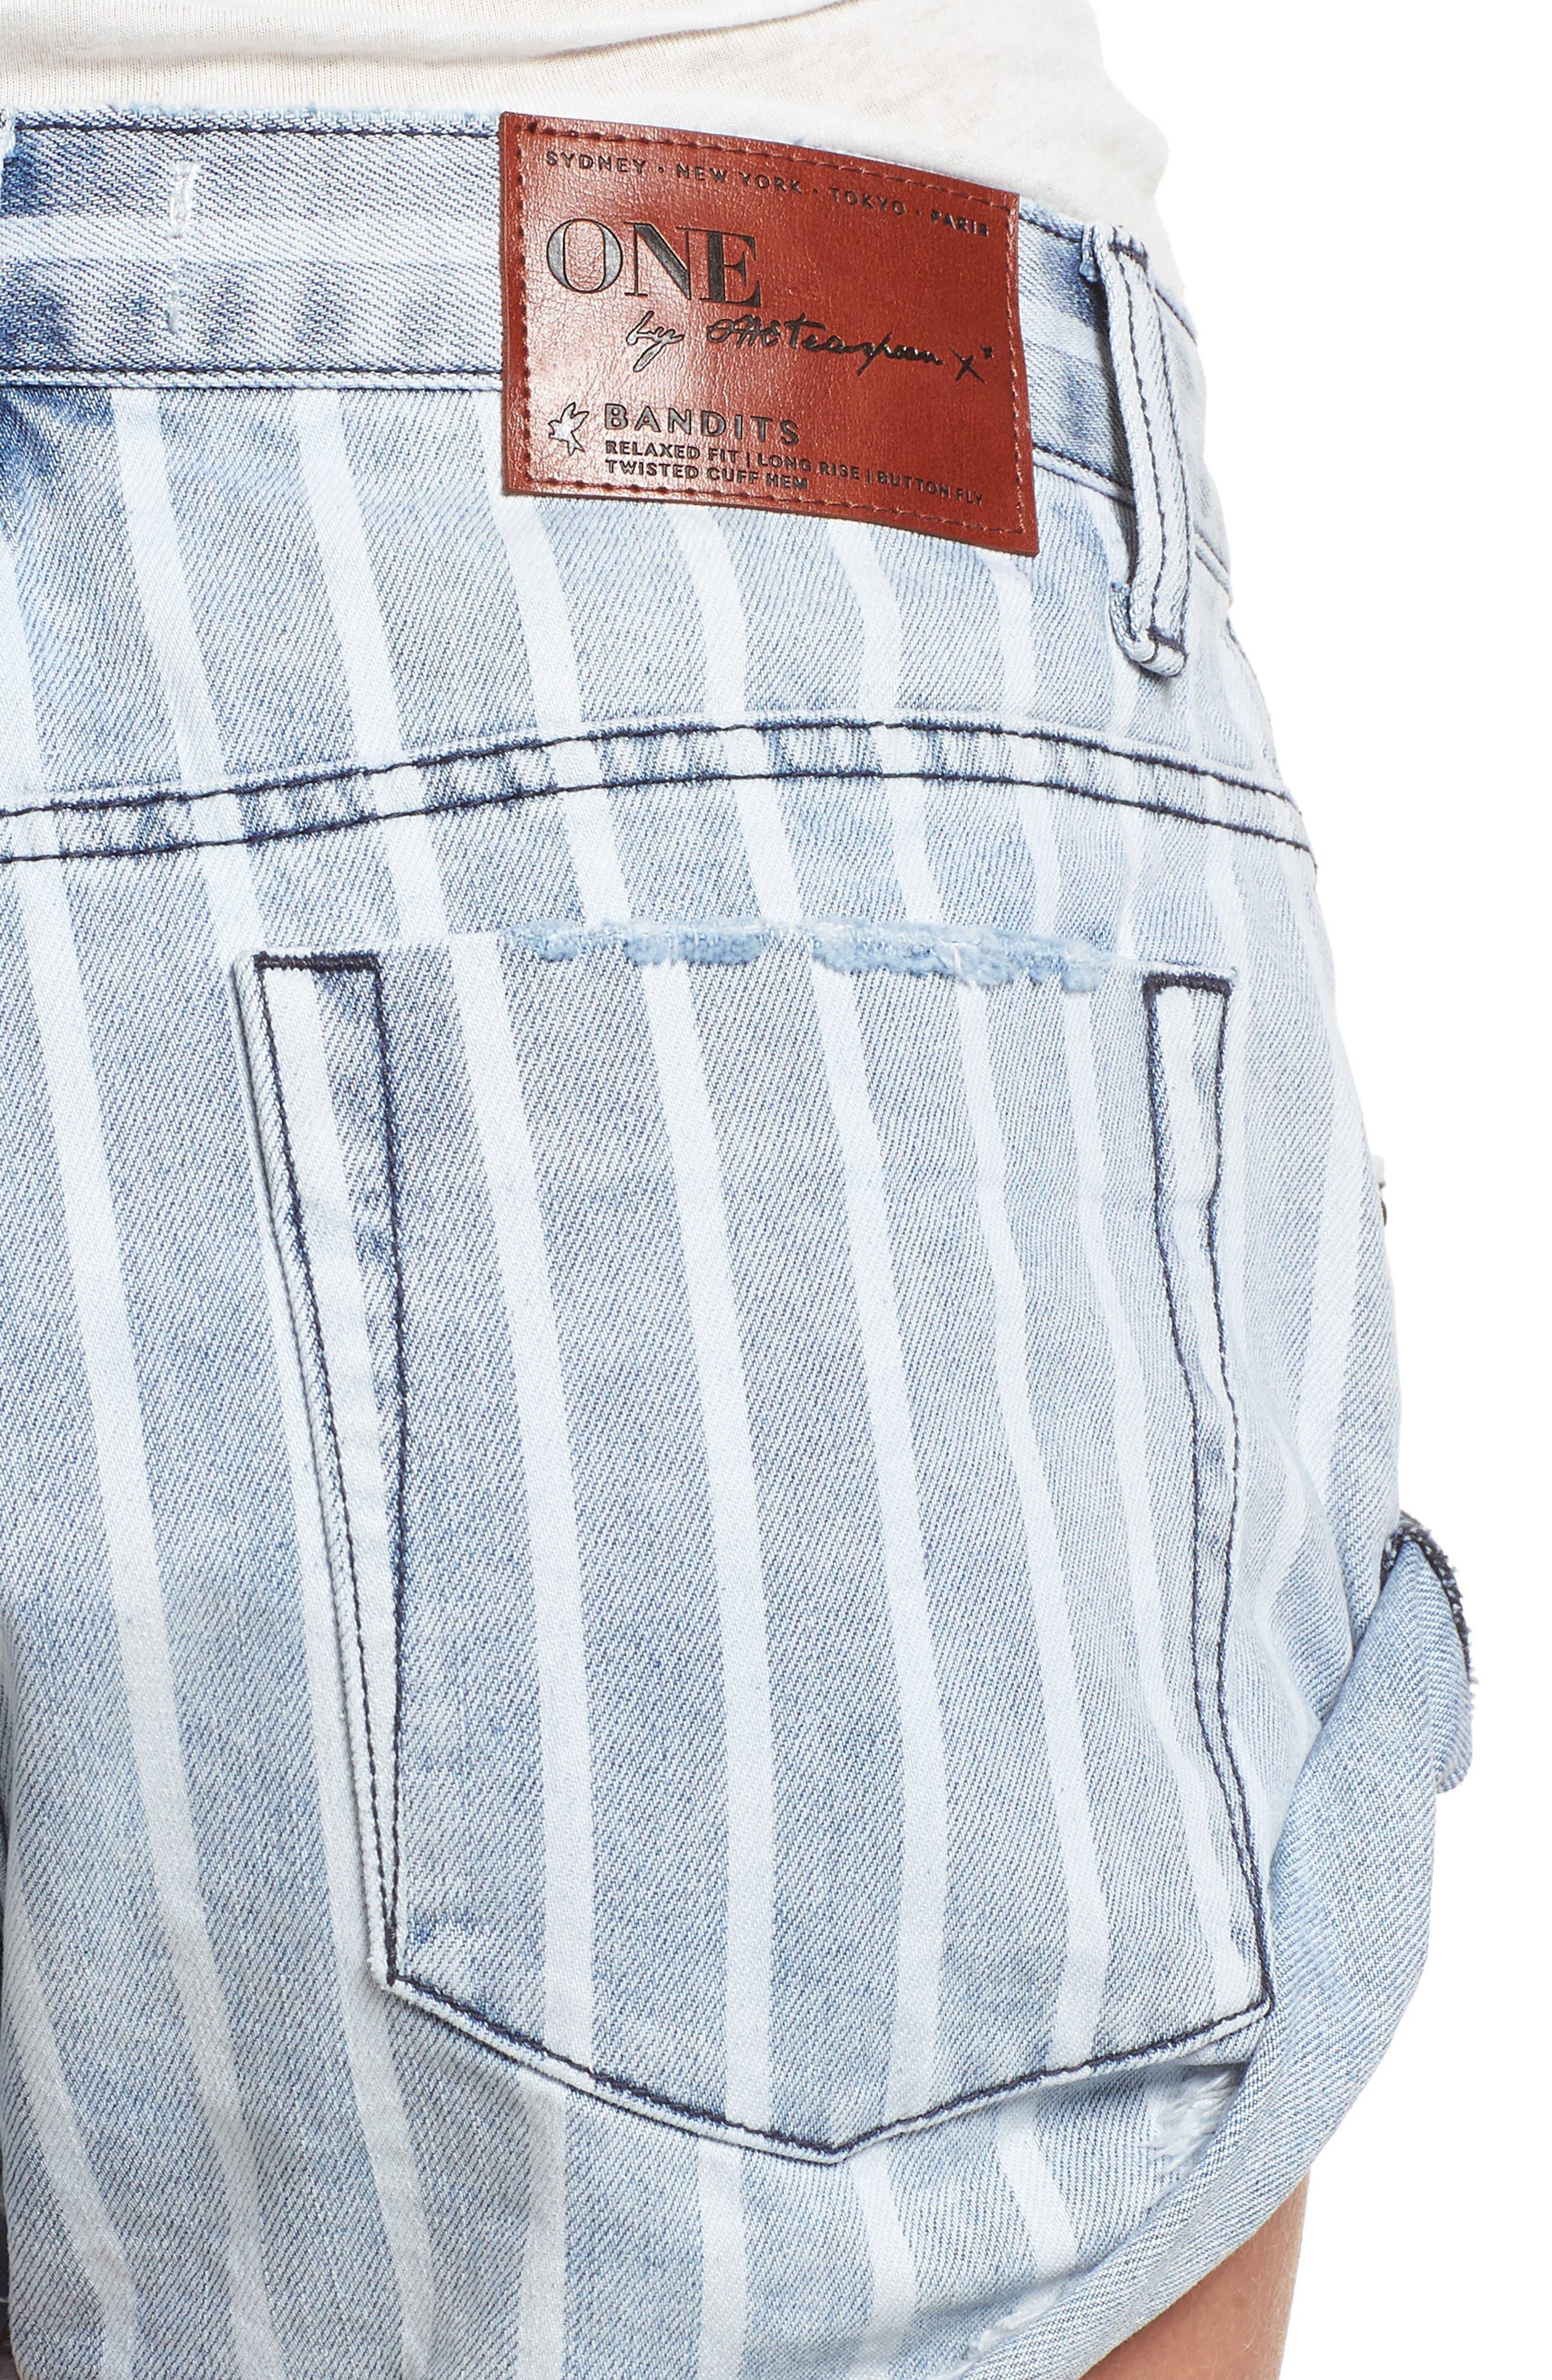 Bandit Stripe Denim Shorts,                             Alternate thumbnail 4, color,                             400